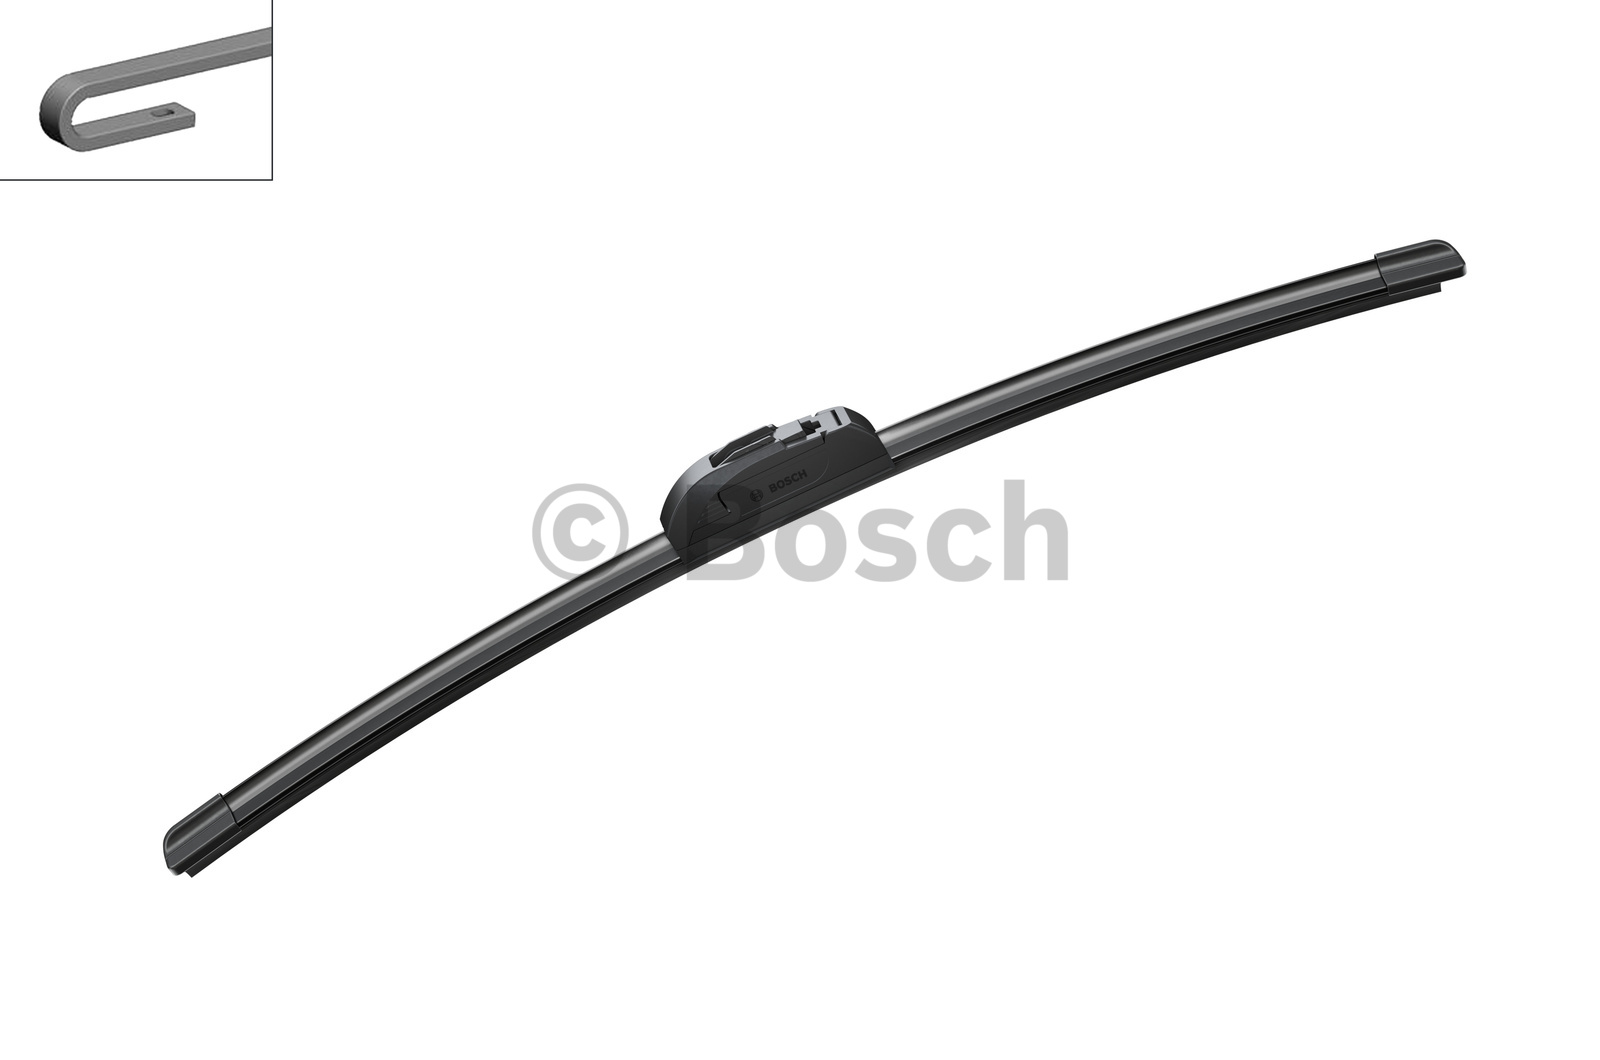 Bosch 3397008535 Щетка бескаркасная, крючок, 500мм